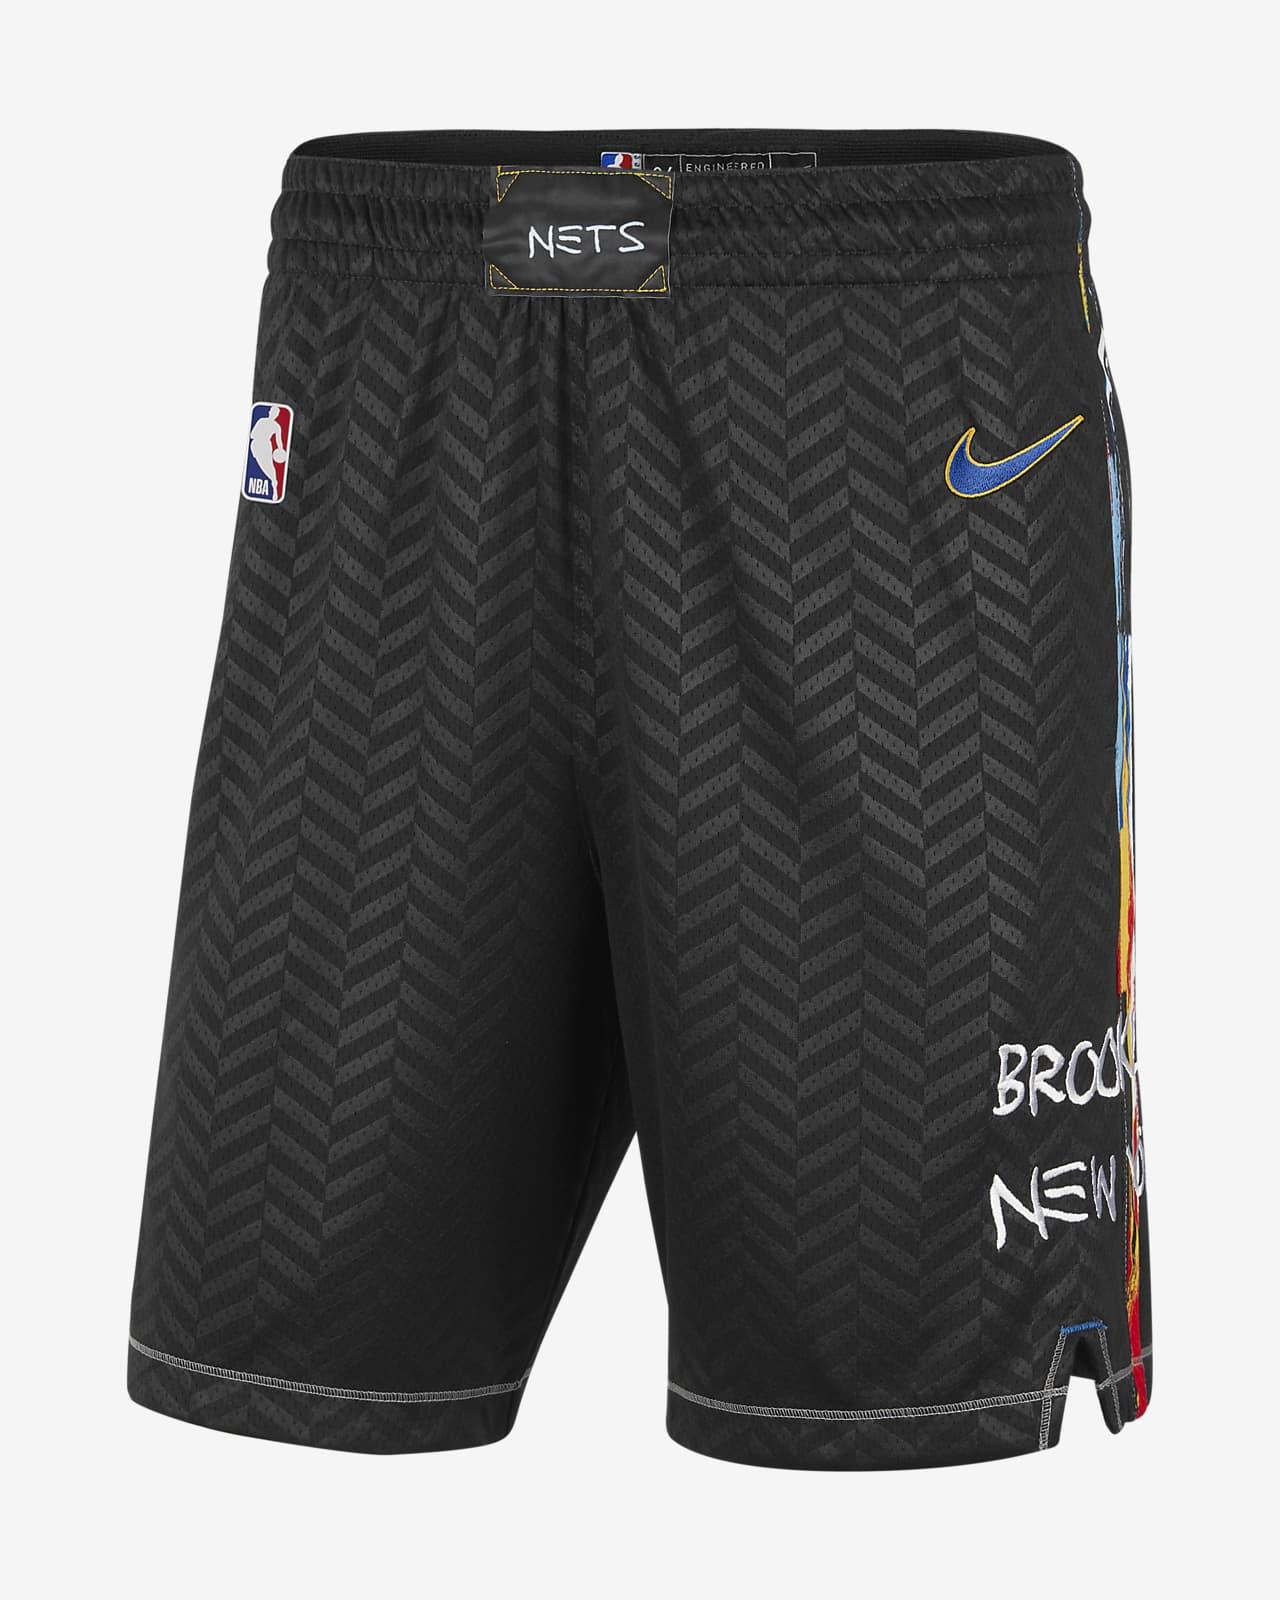 Brooklyn Nets City Edition 2020 Pantalons curts Nike NBA Swingman - Home